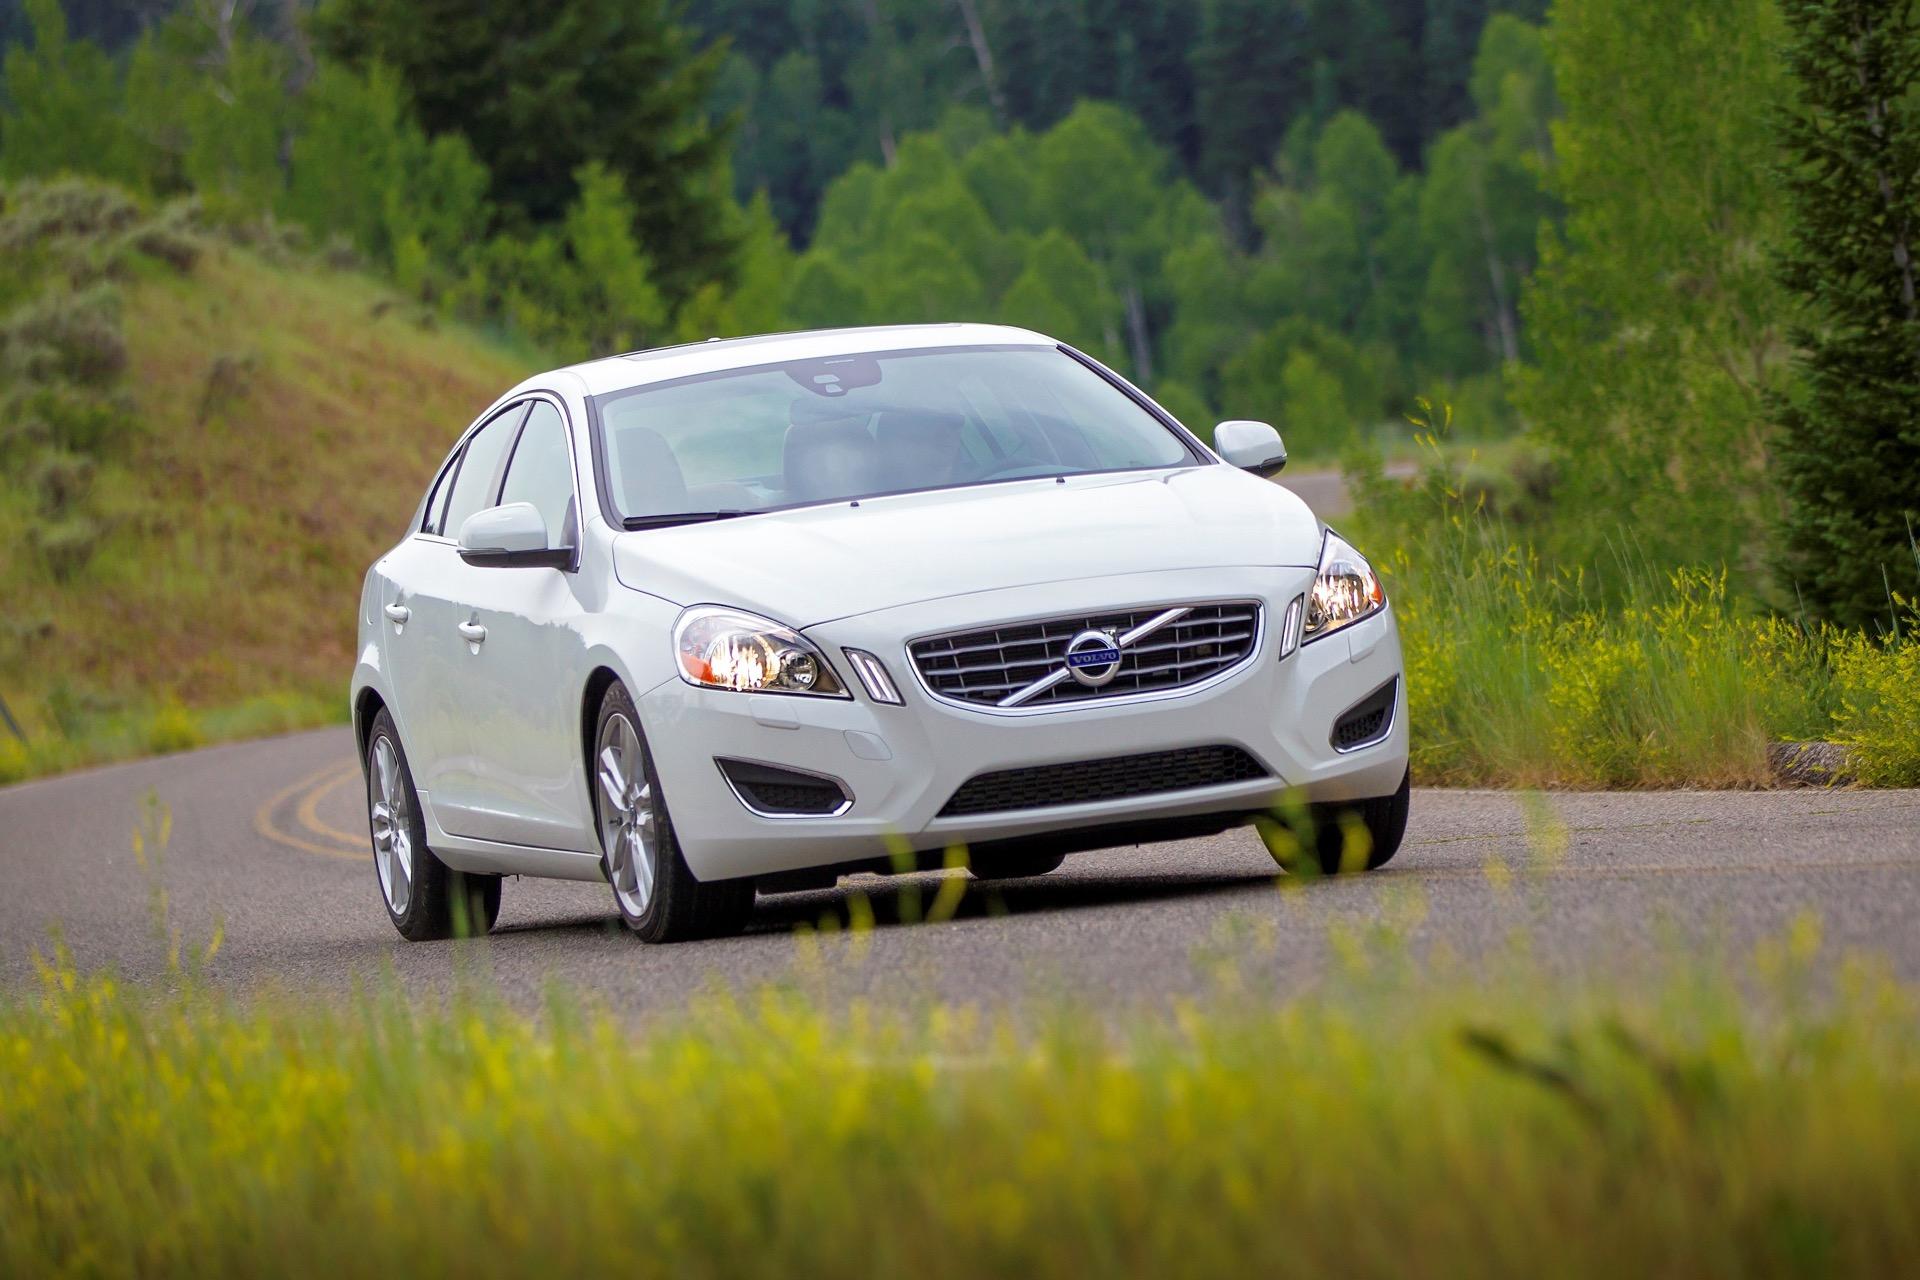 S60 T5 Awd05 -  Volvo